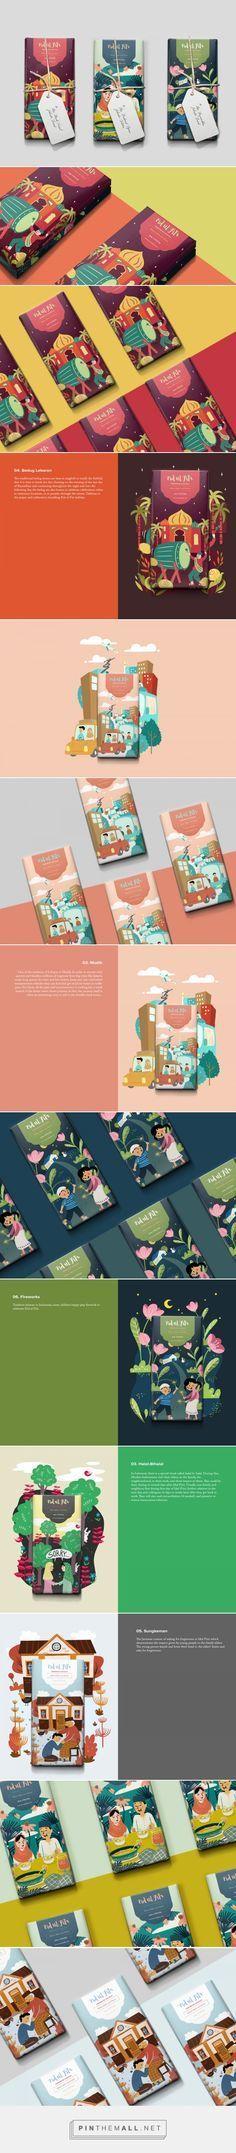 Lebaran Nyok! Chocolate Bars / Designed by Nero Graphic Atelier